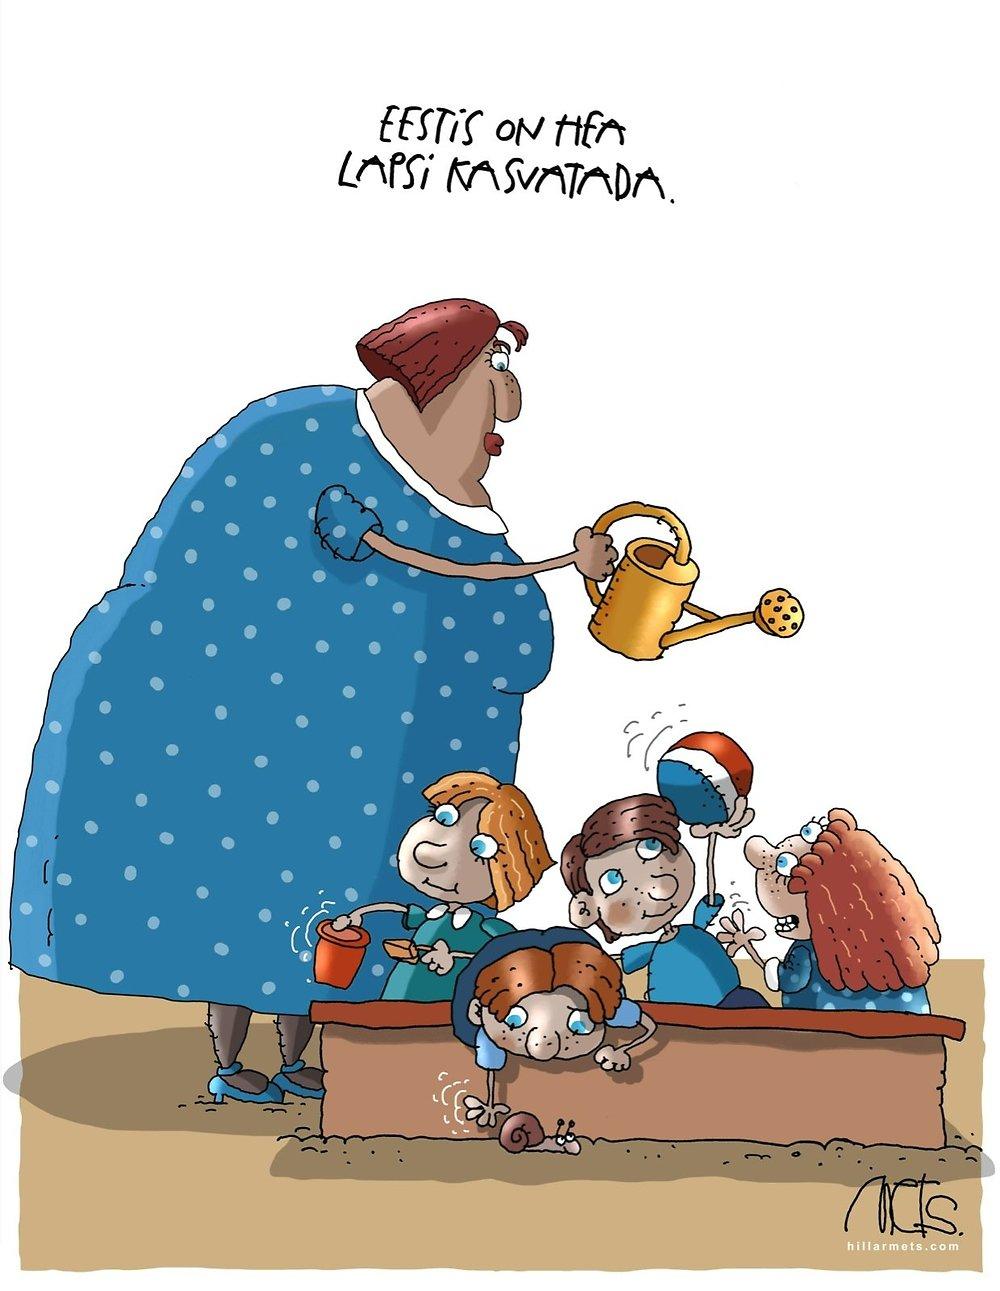 10 ettepanekut vanemahüvitise parandamiseks – Liisa Pakosta